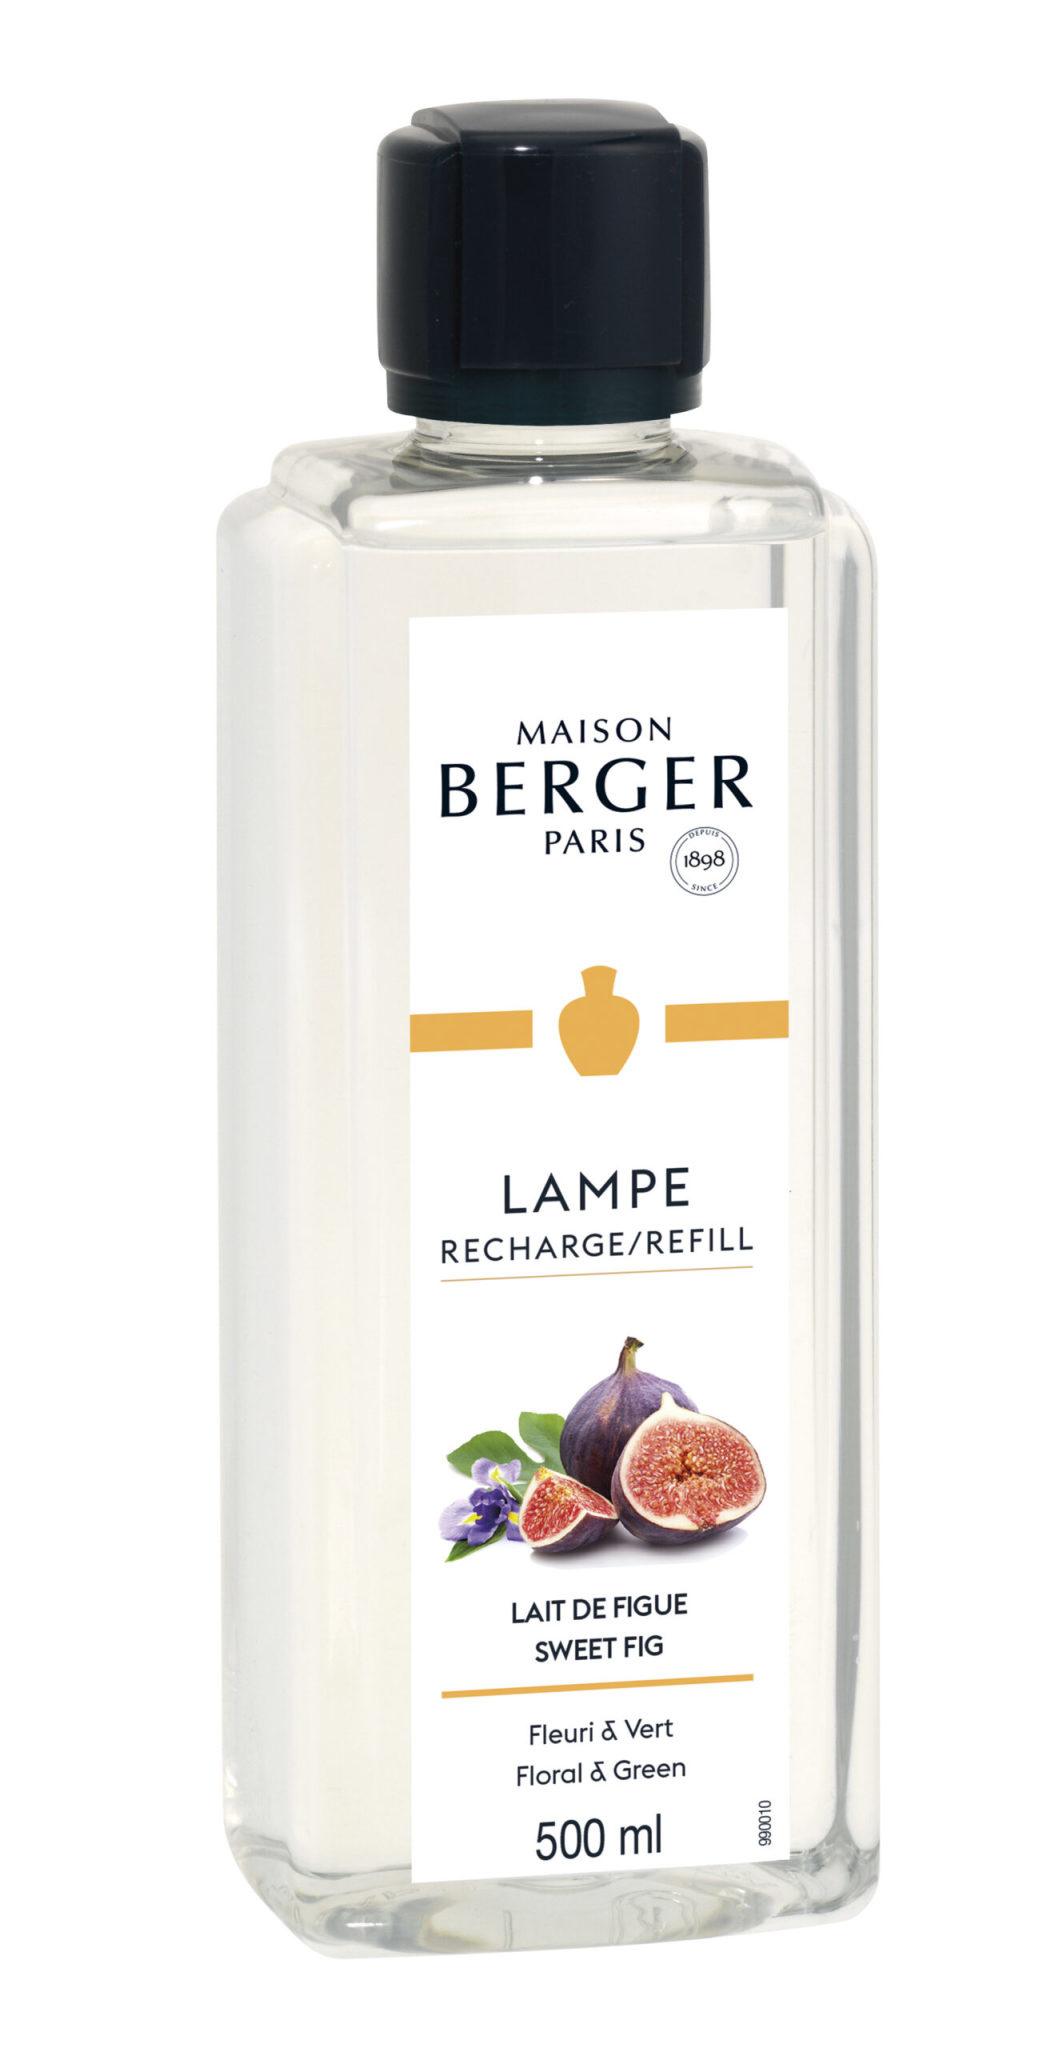 Lampe Berger Huisparfum Lait de Figue 500ml